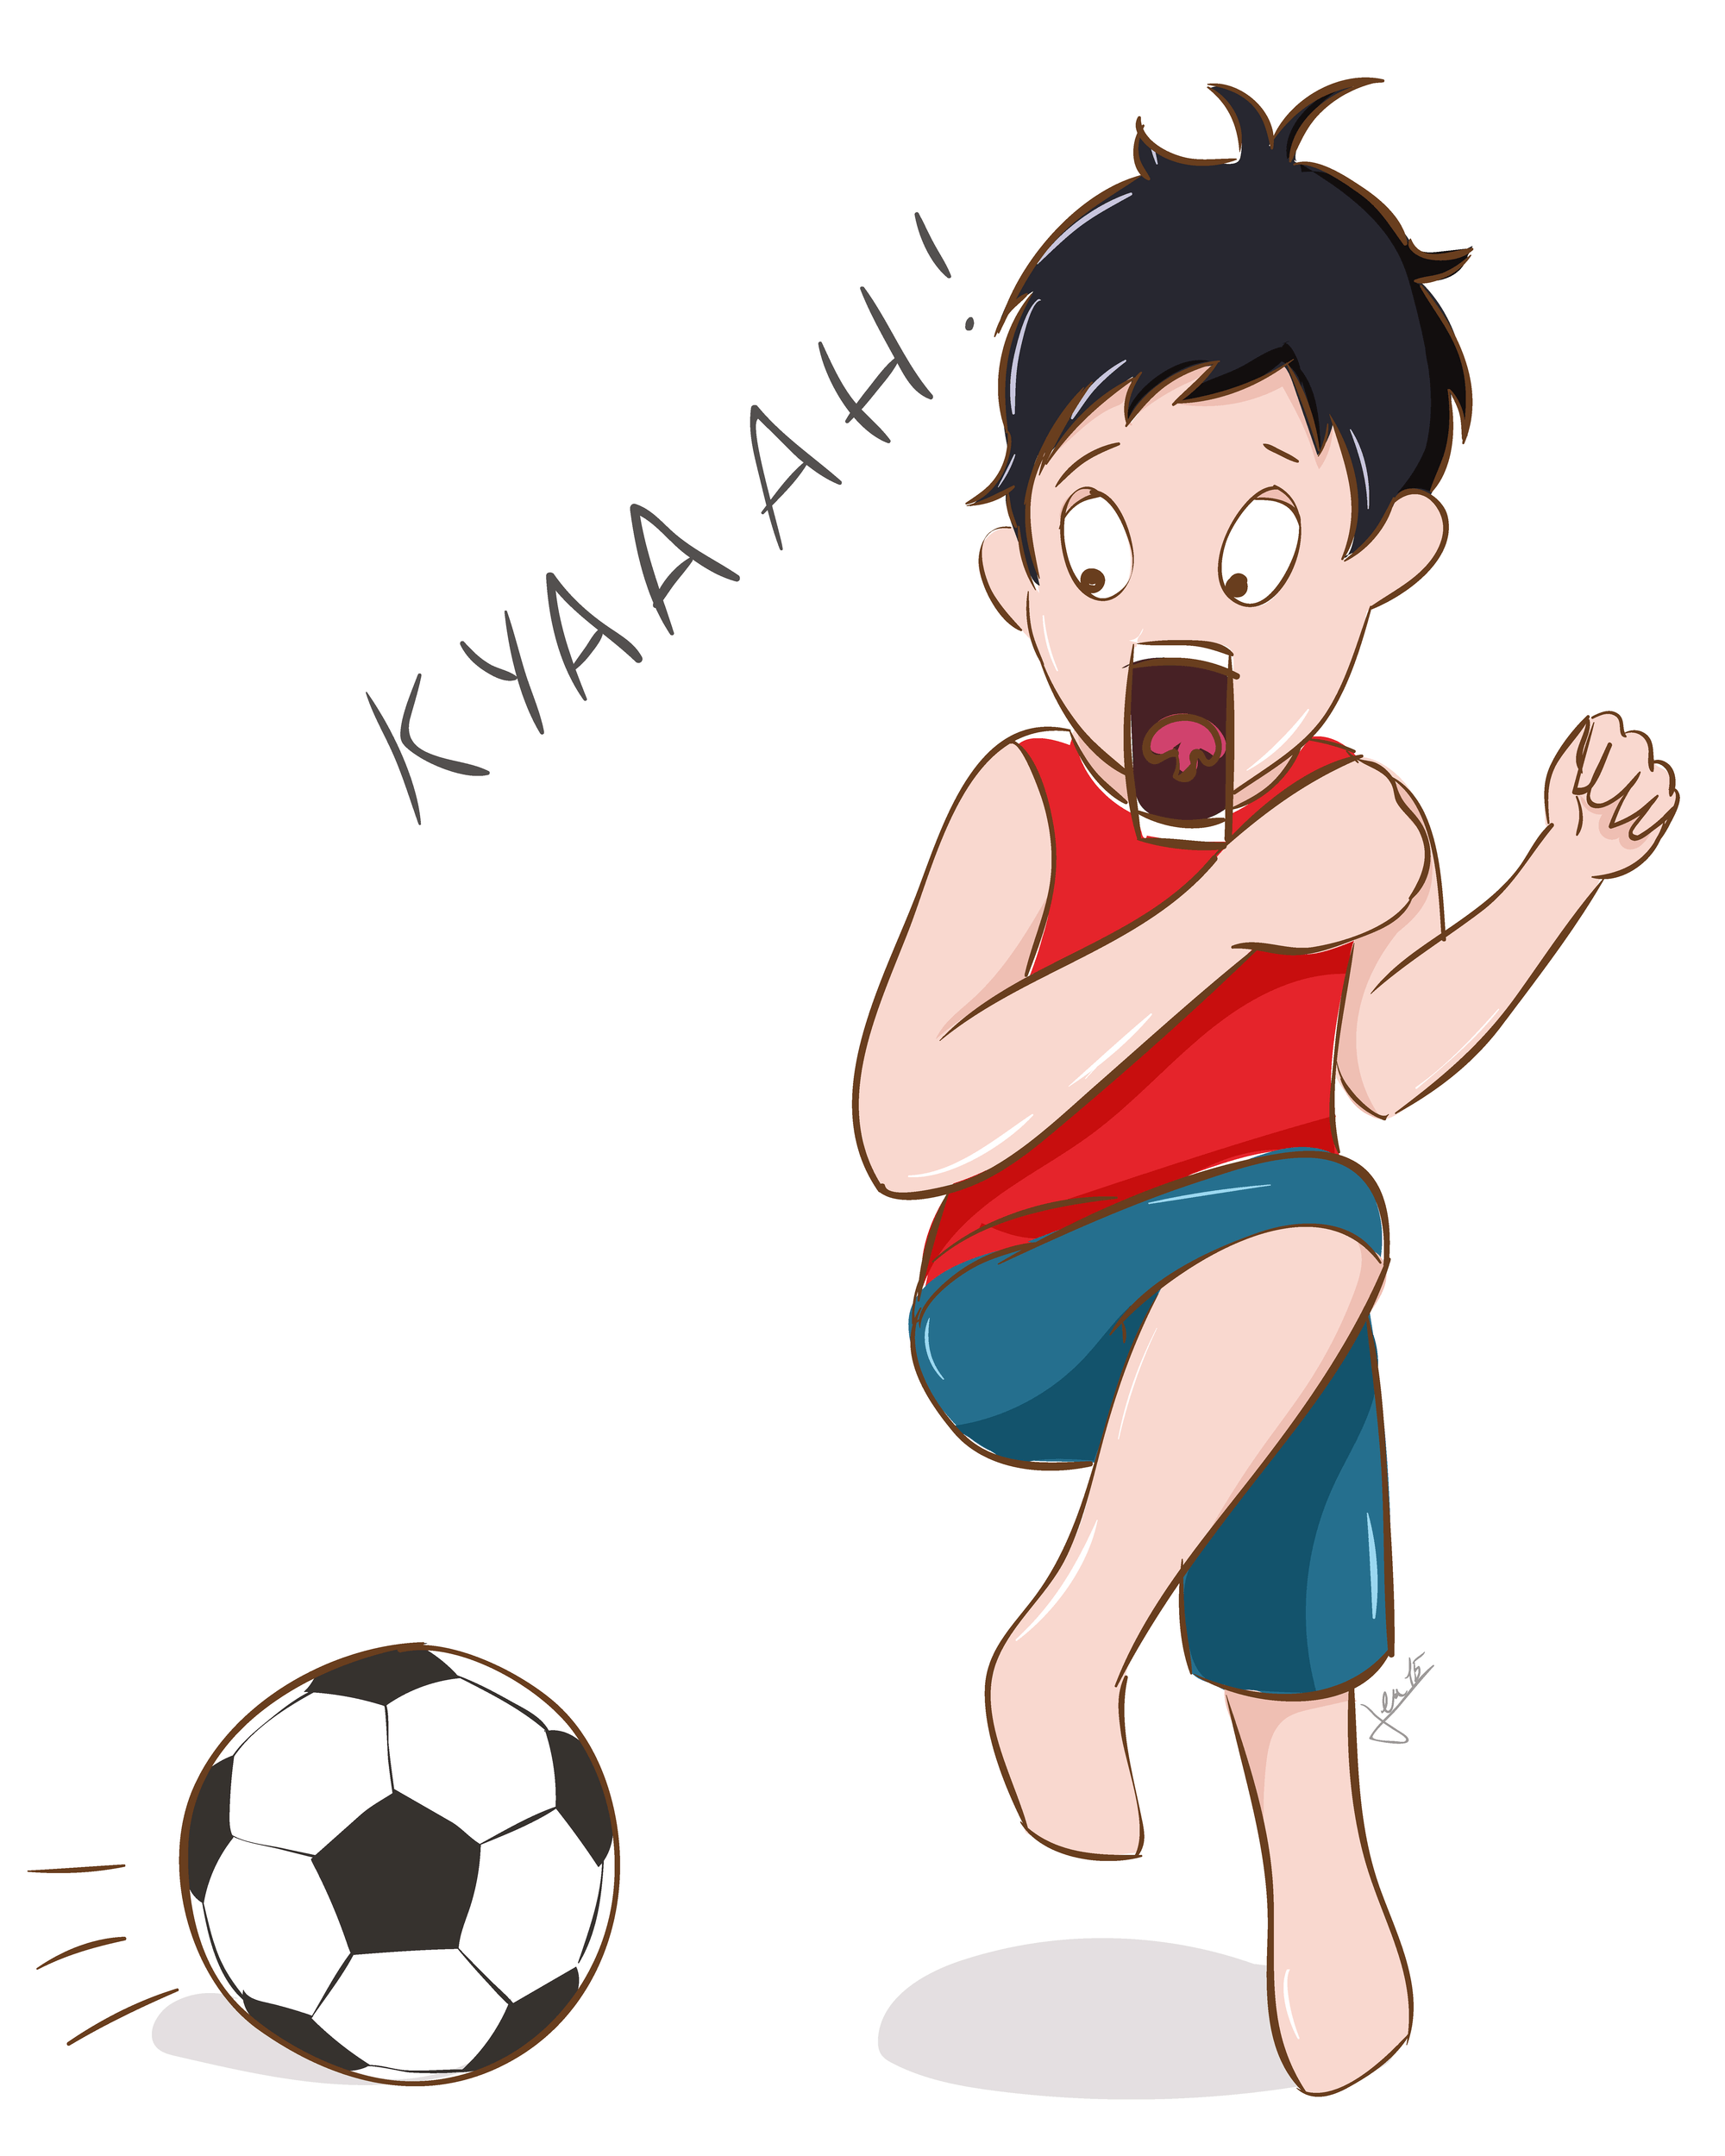 Ex. 2 Football